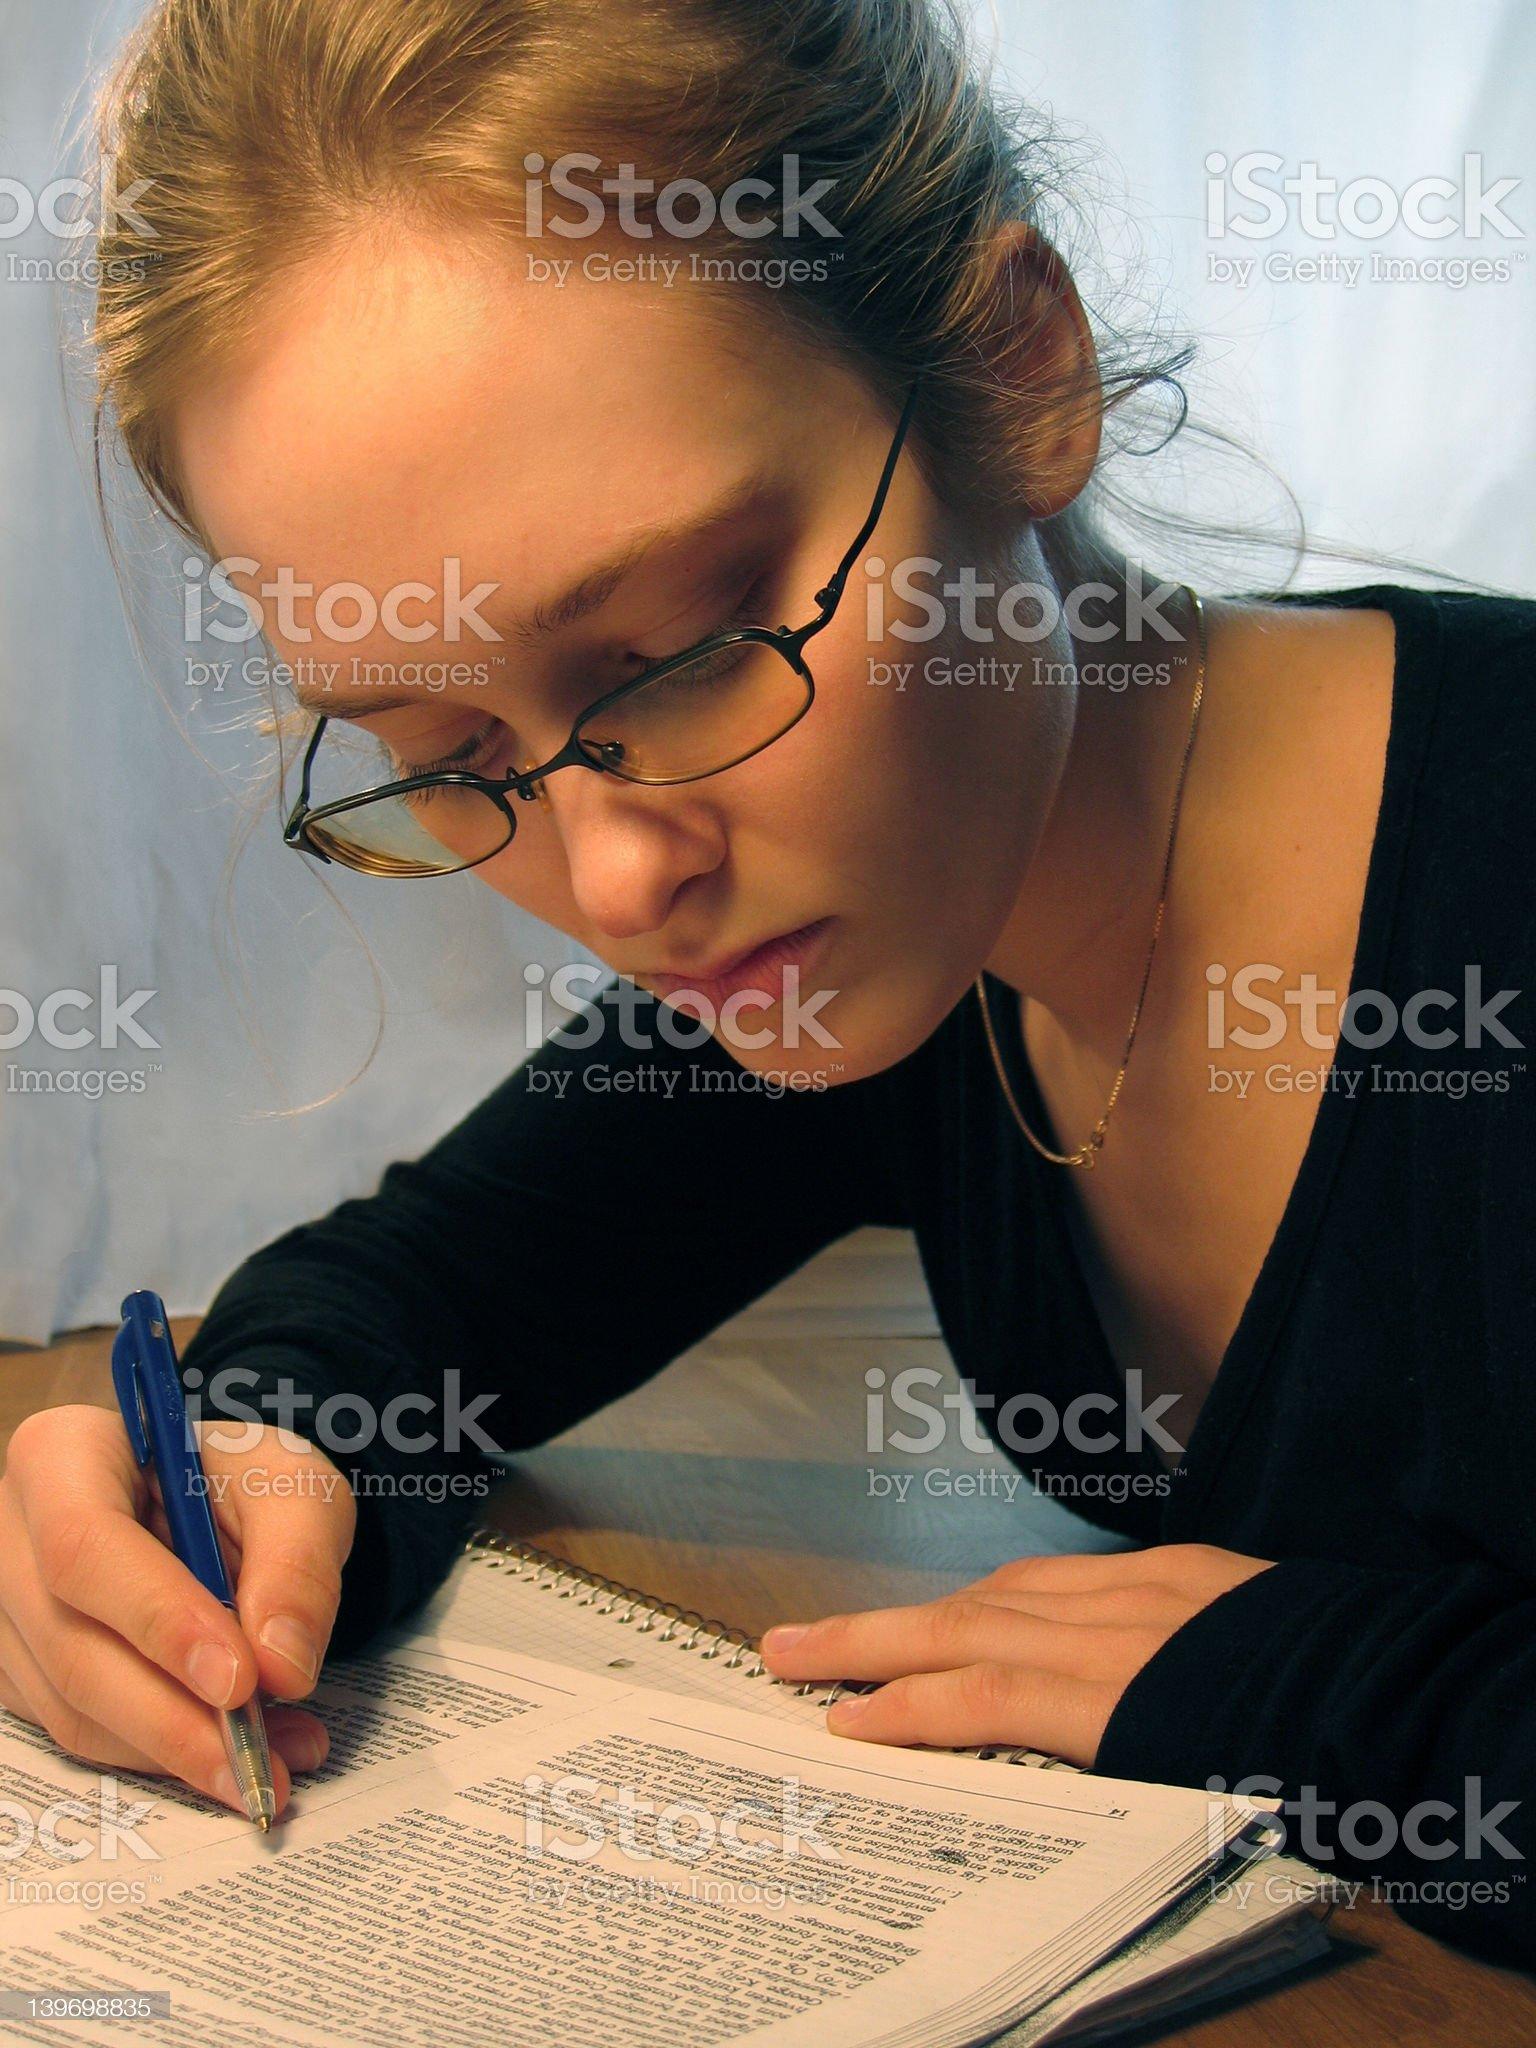 Girl Taking Notes royalty-free stock photo